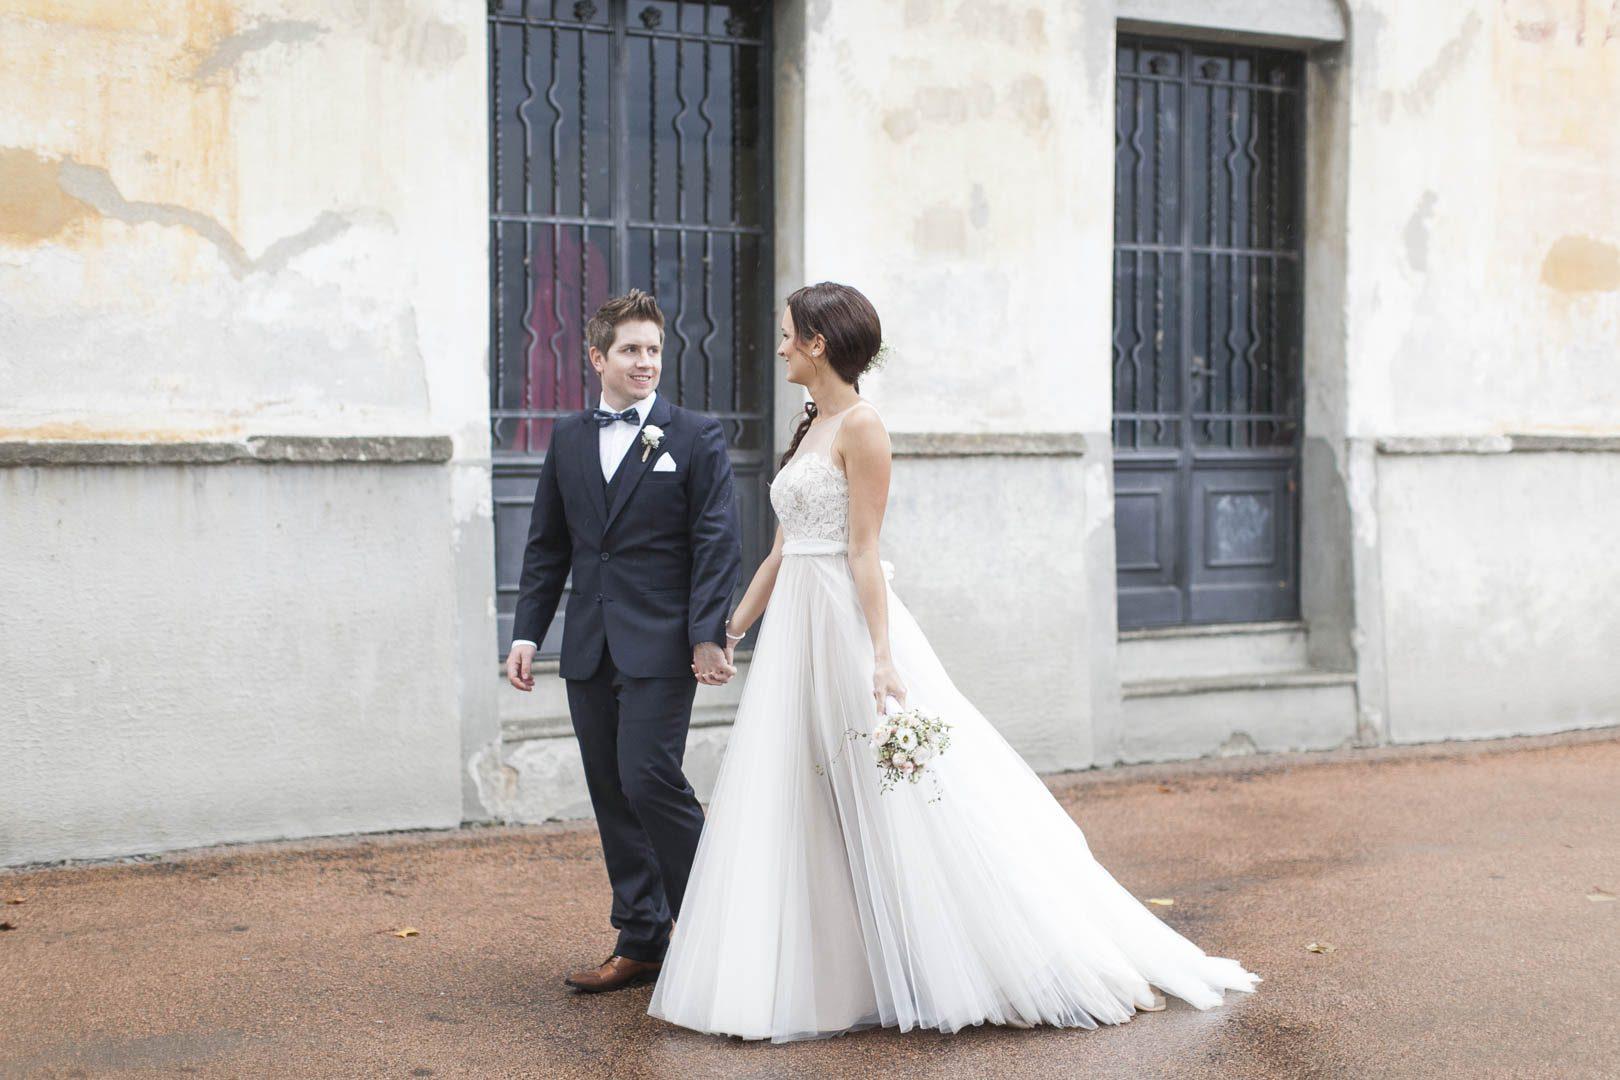 Hochzeit Minusio, Tessin Fotoshooting The Wedding Day